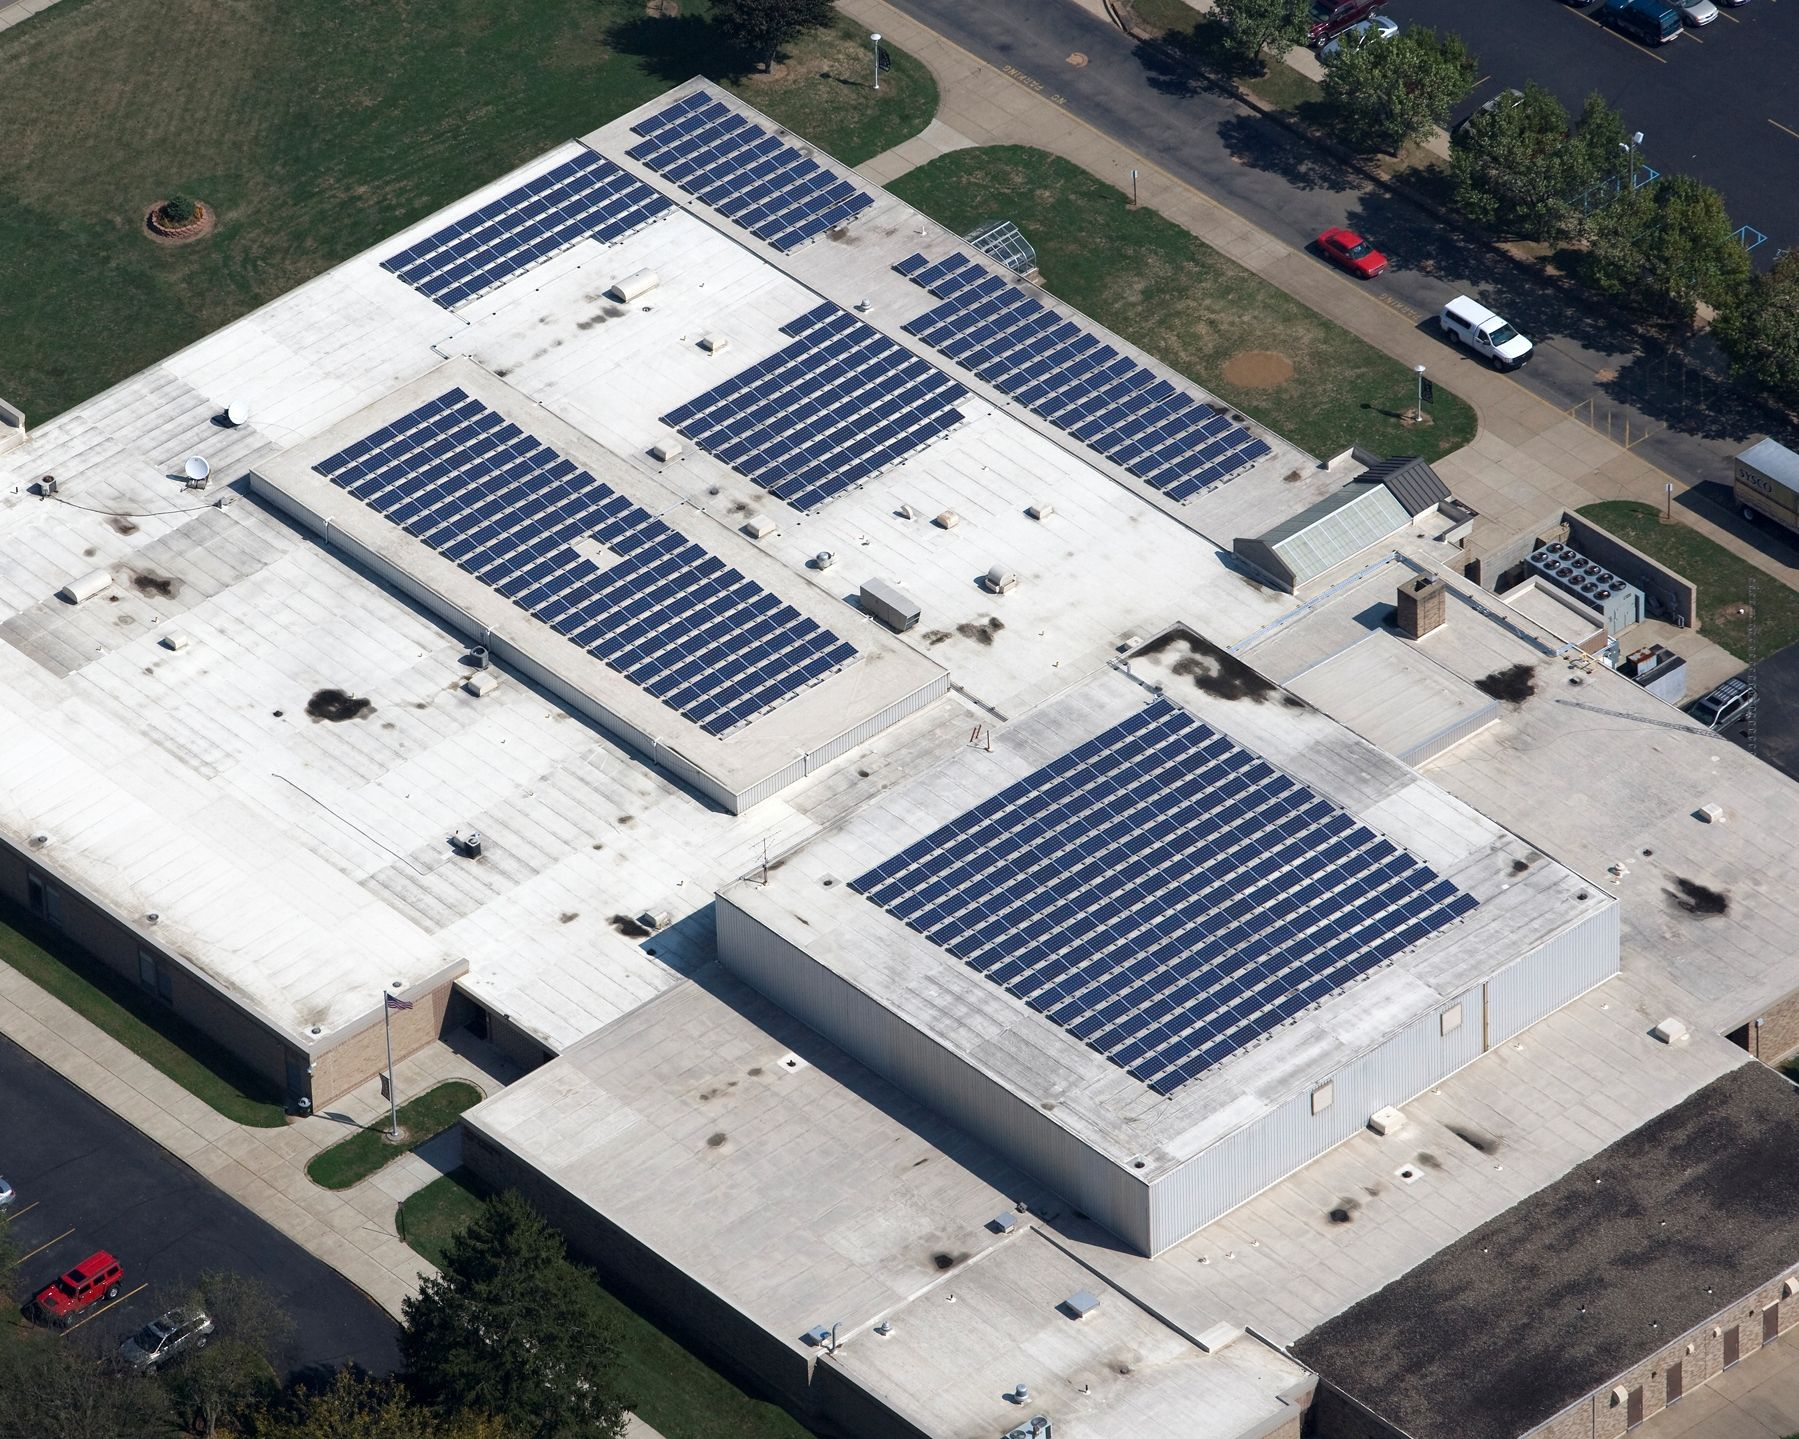 High school roof in ohio roof solar panel solar